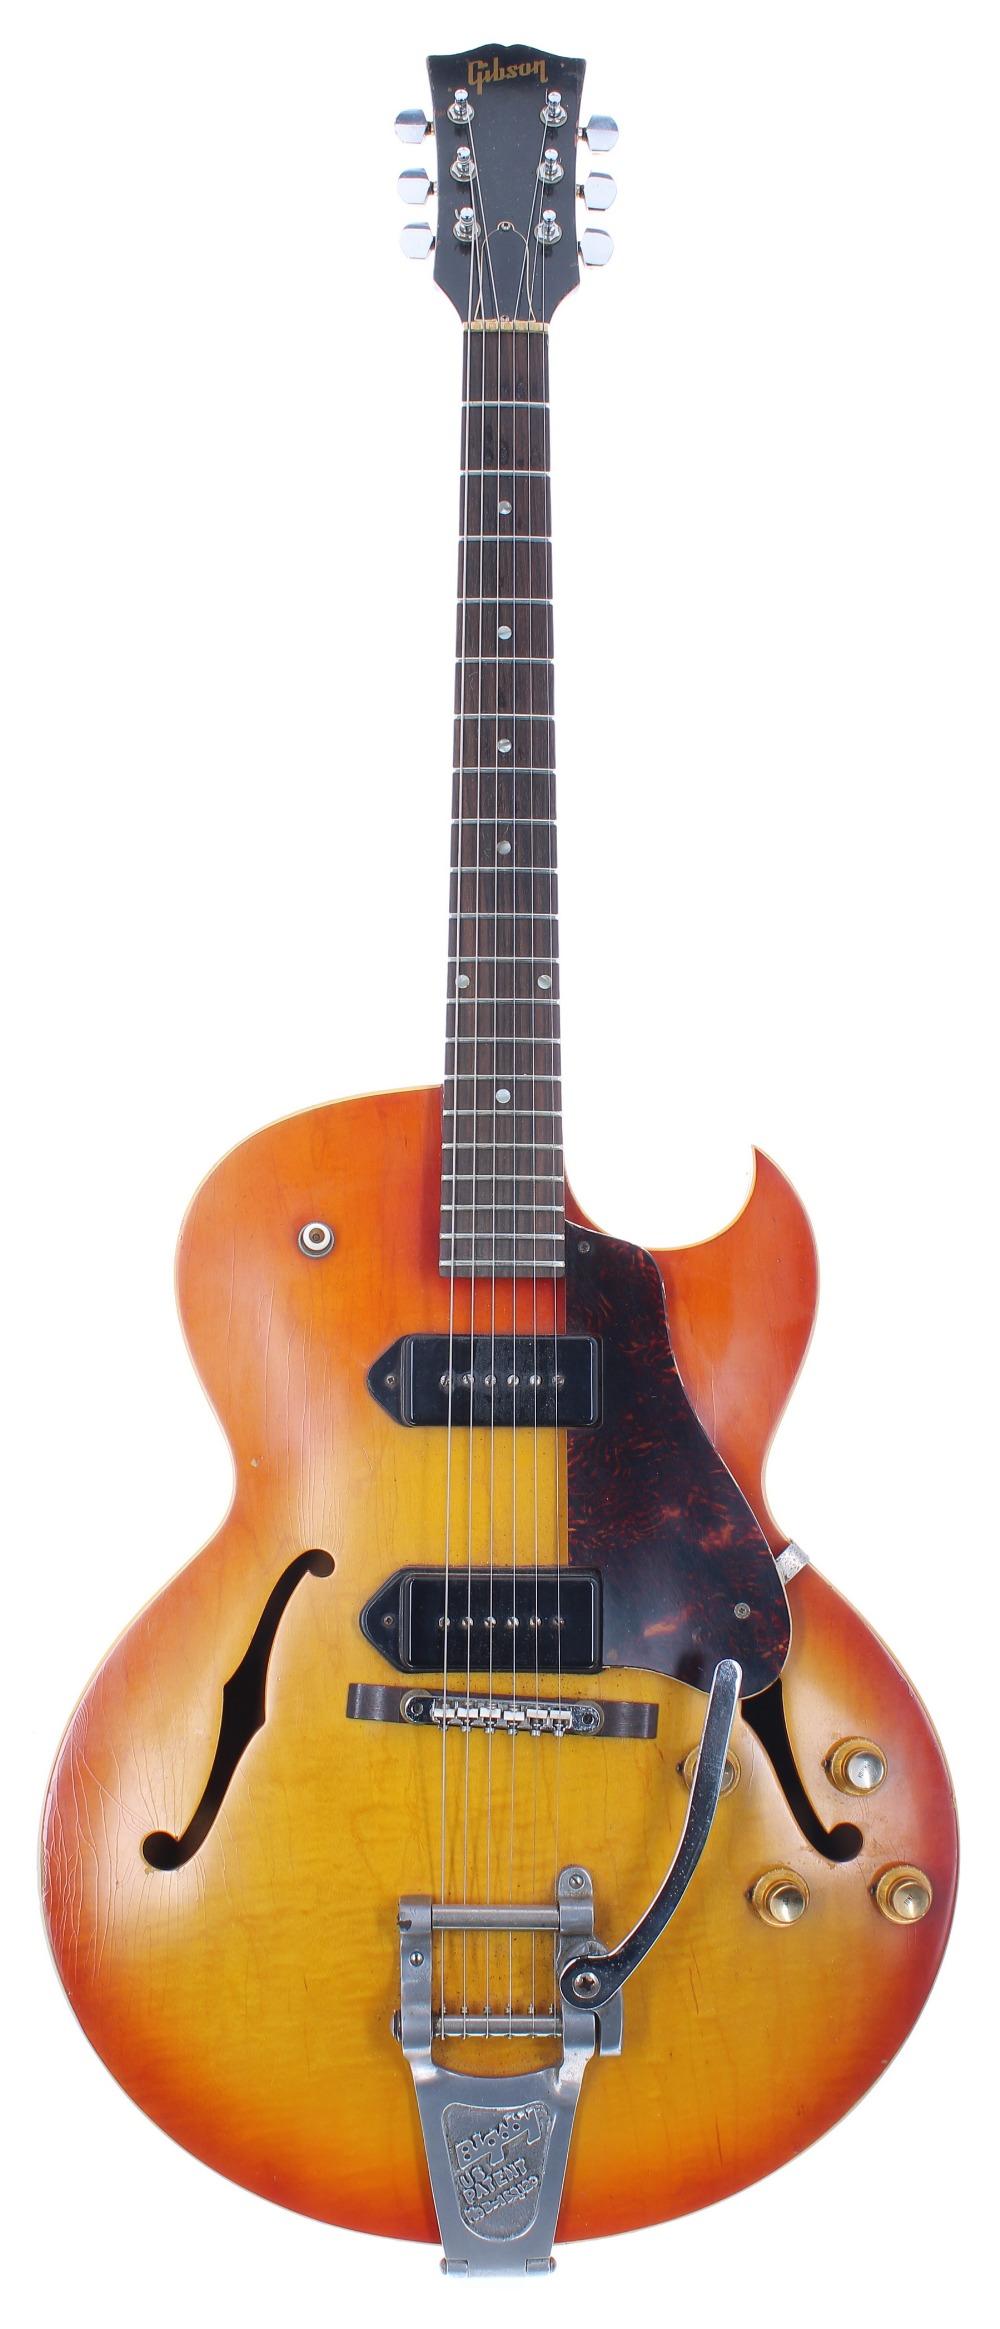 1966 Gibson ES-125 TDC electric guitar, made in USA, ser. no. 4xxxx9; Finish: sunburst, lightly